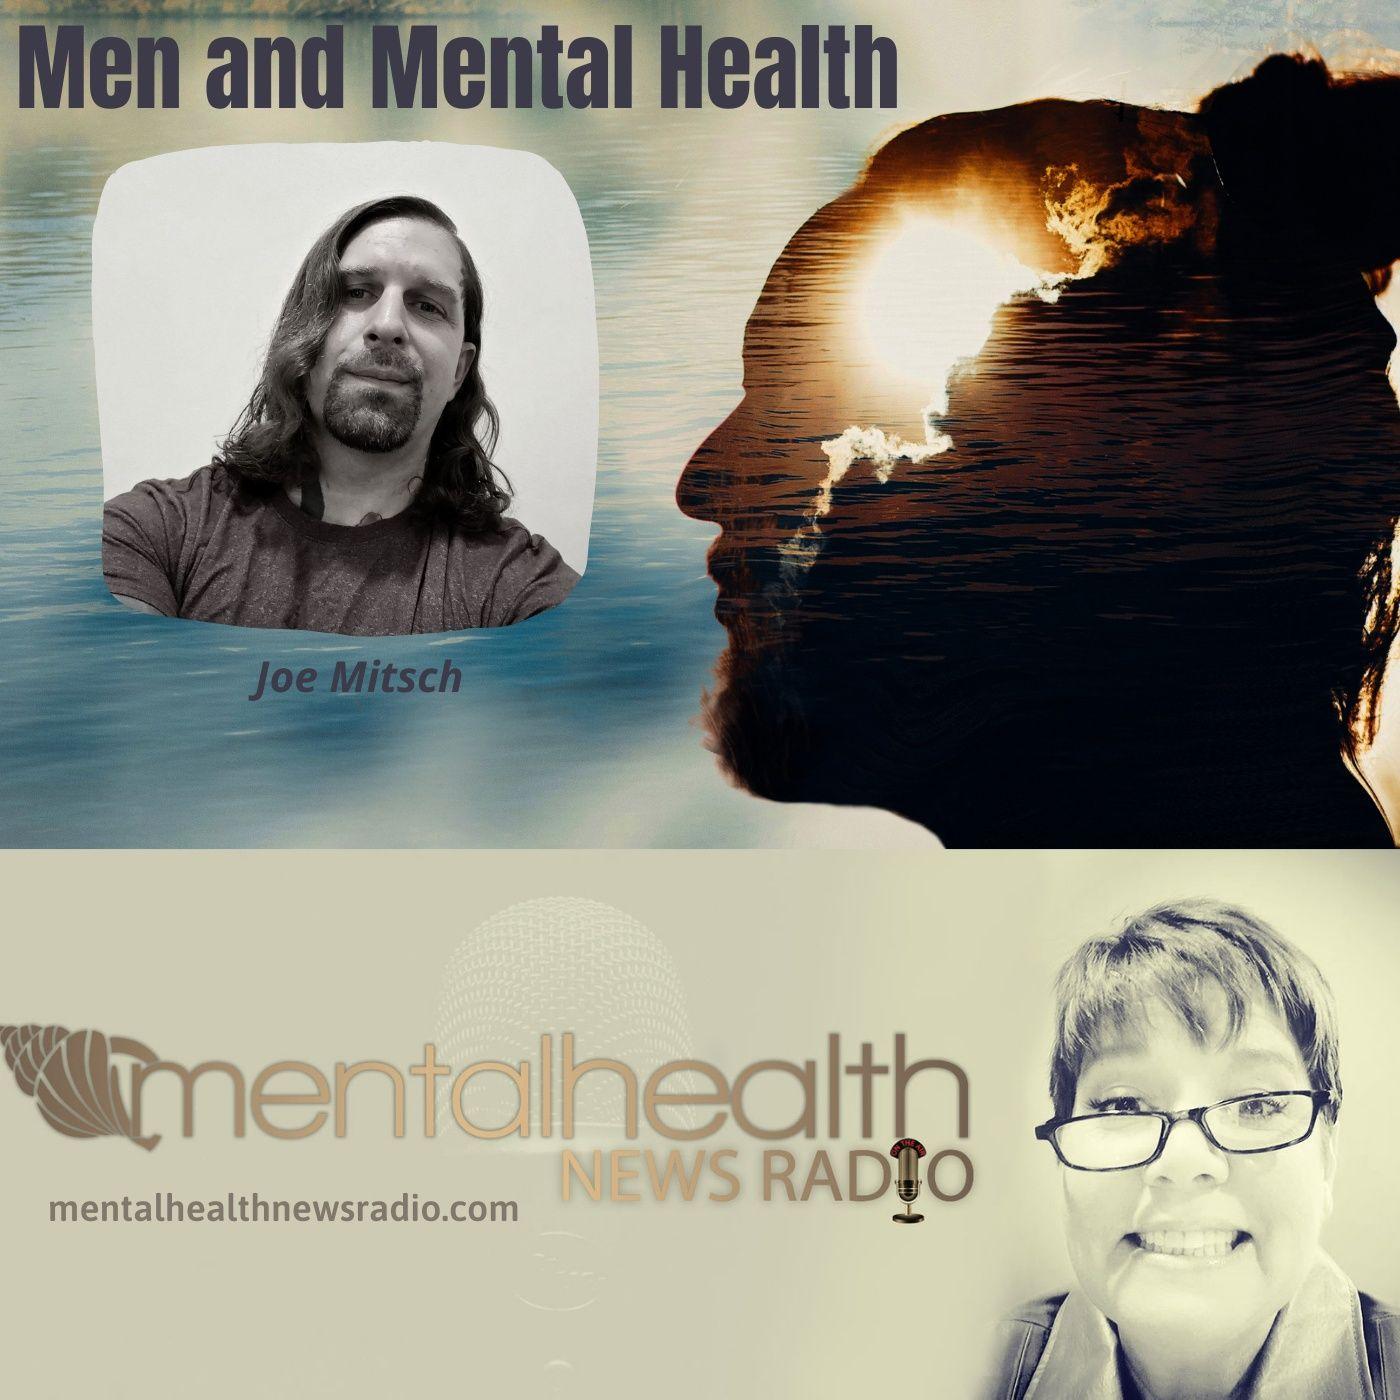 Mental Health News Radio - Men and Mental Health with Joe Mitsch